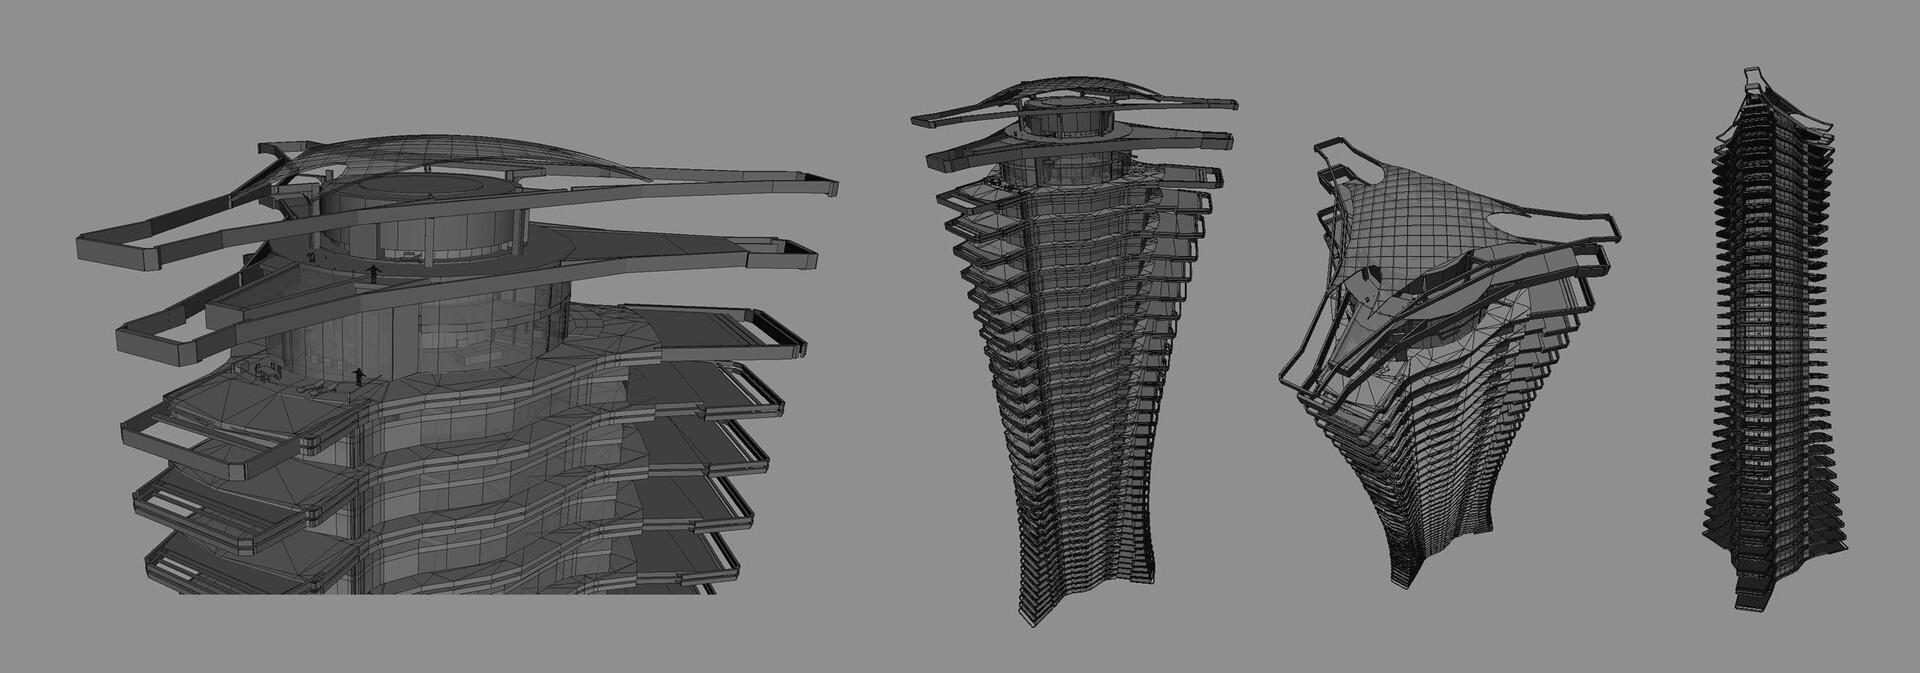 Concept art 3D